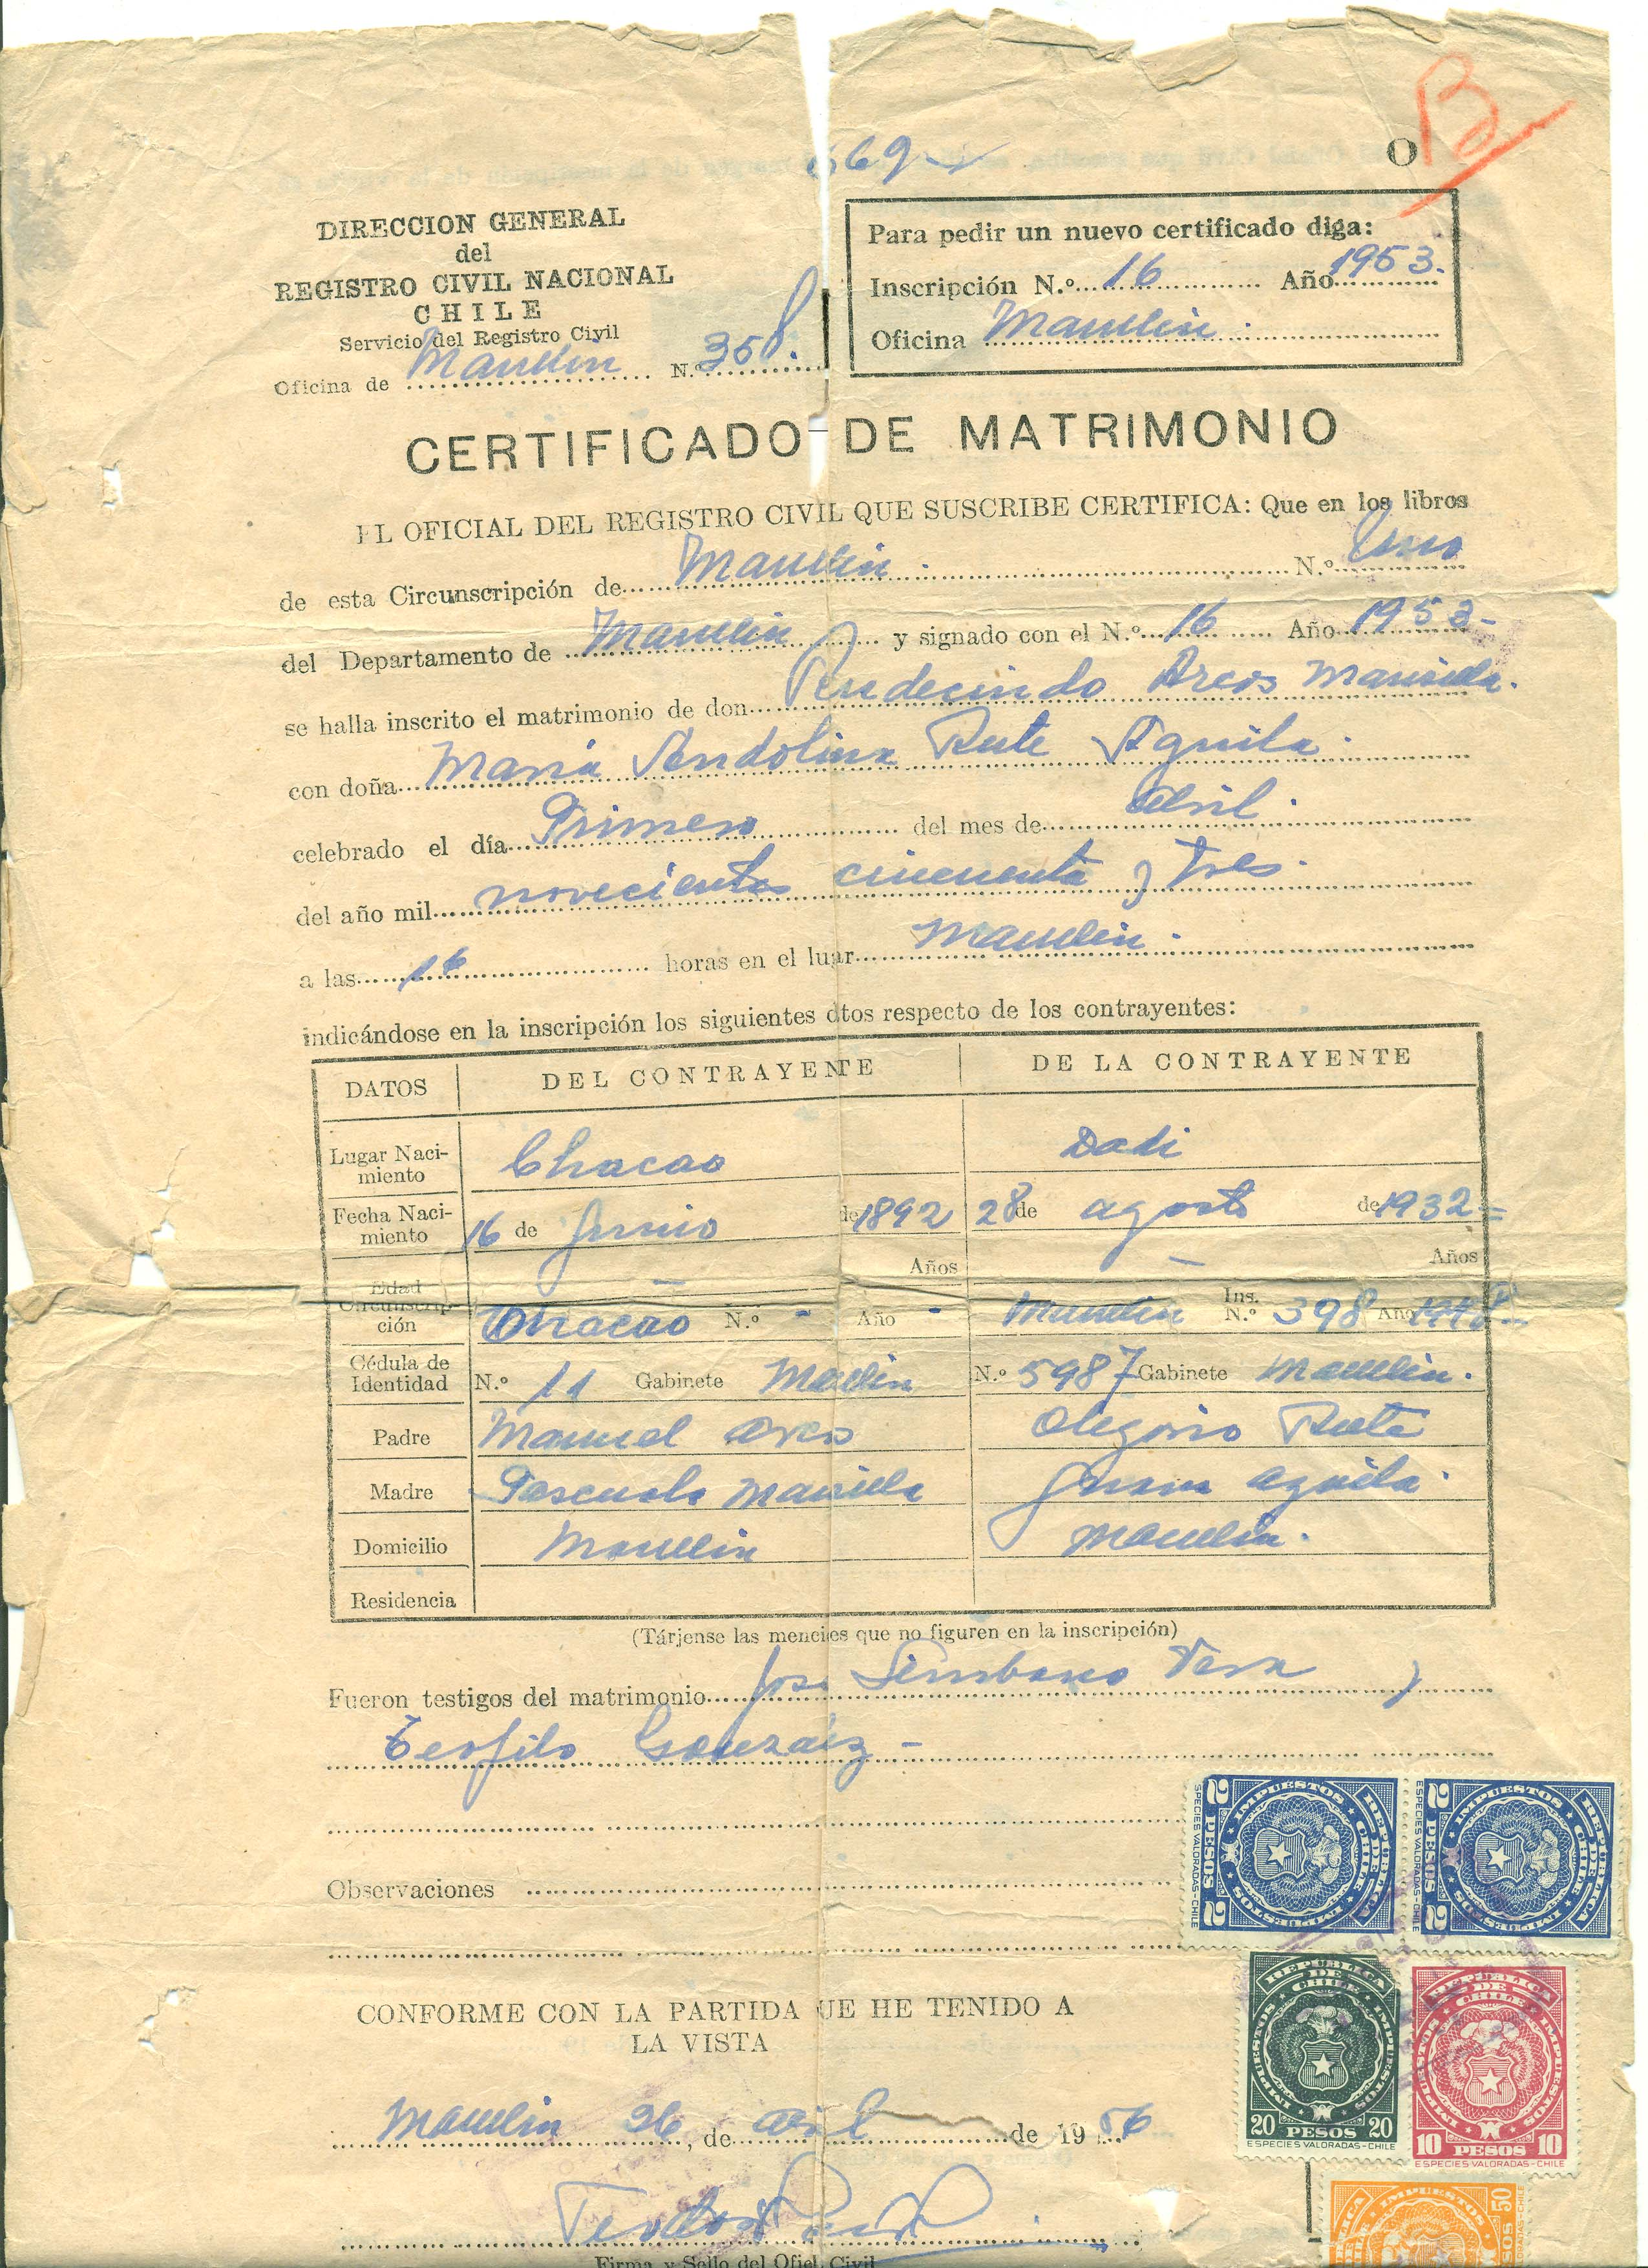 Registro De Matrimonio Catolico En Notaria : Certificado de matrimonio memorias del siglo xx chile